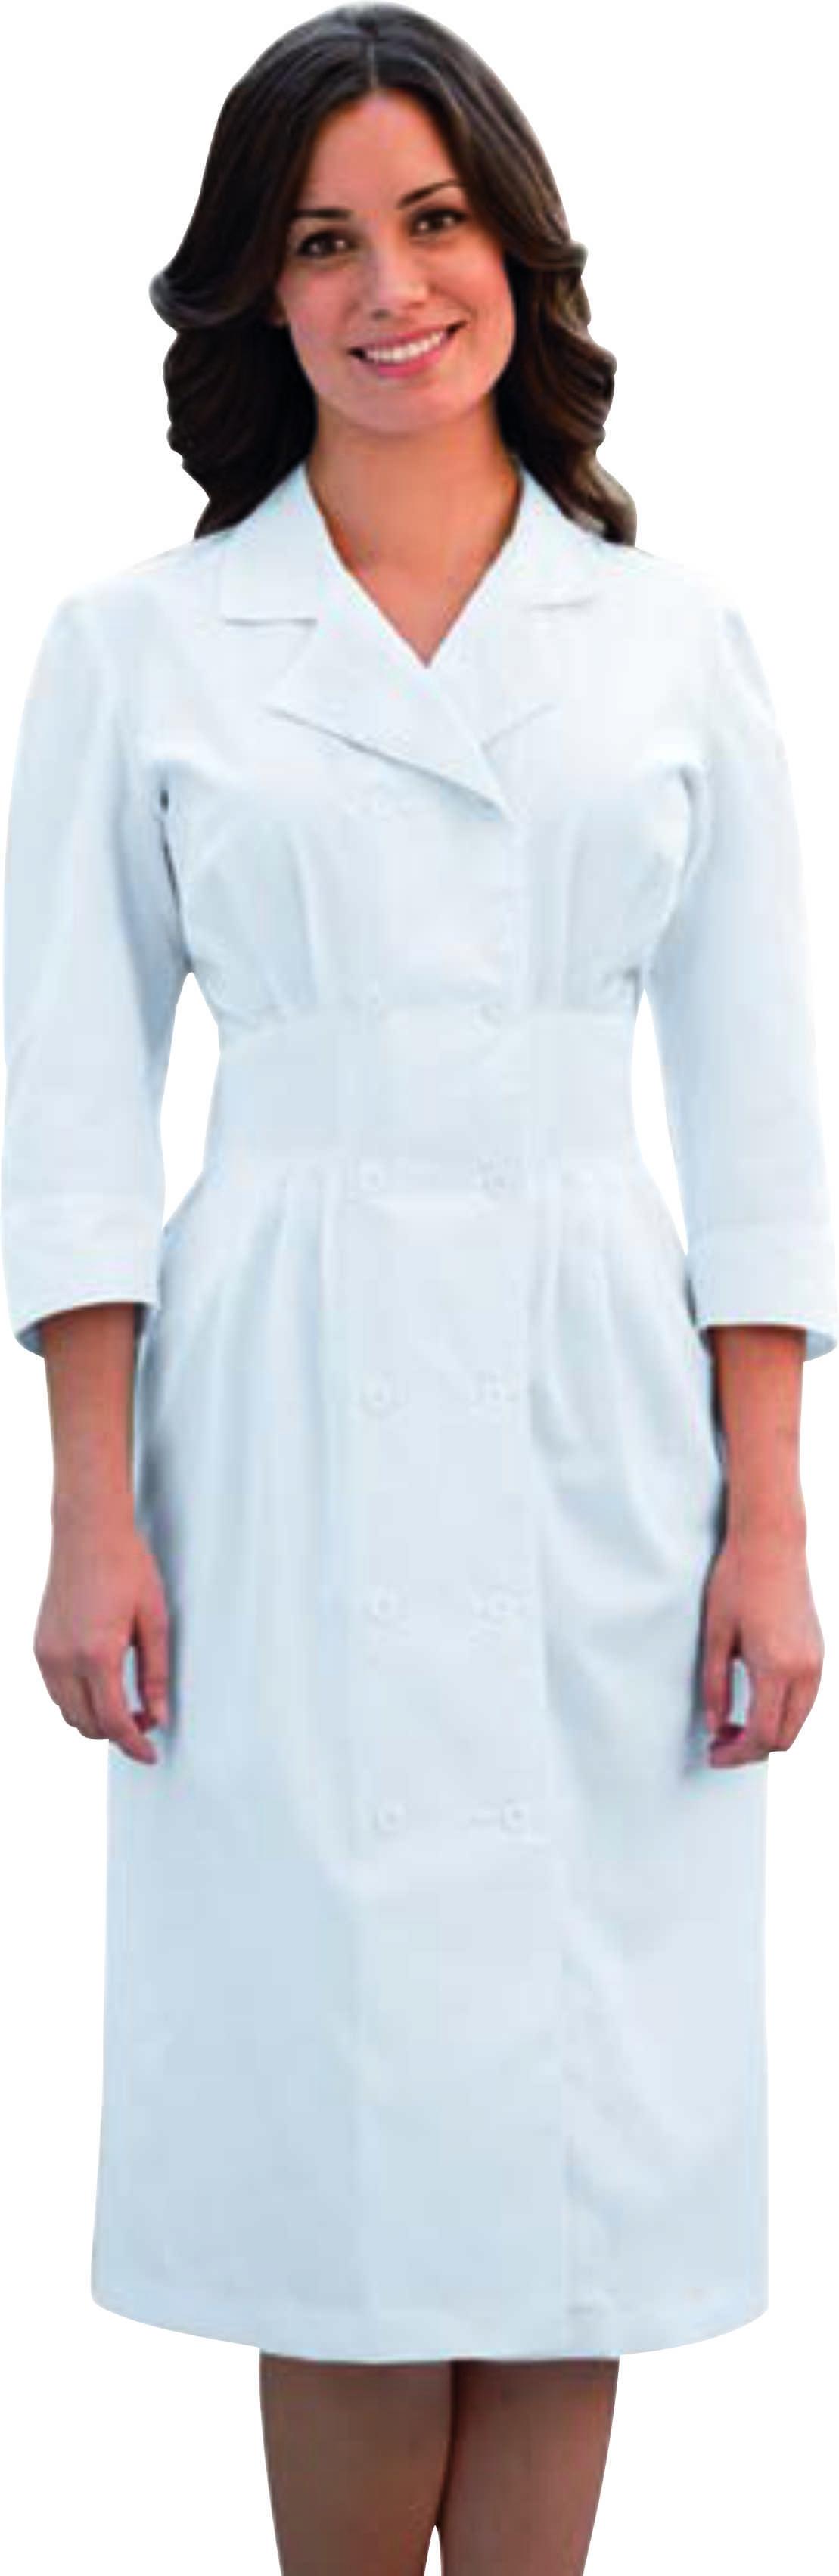 Nurse Tunics 02